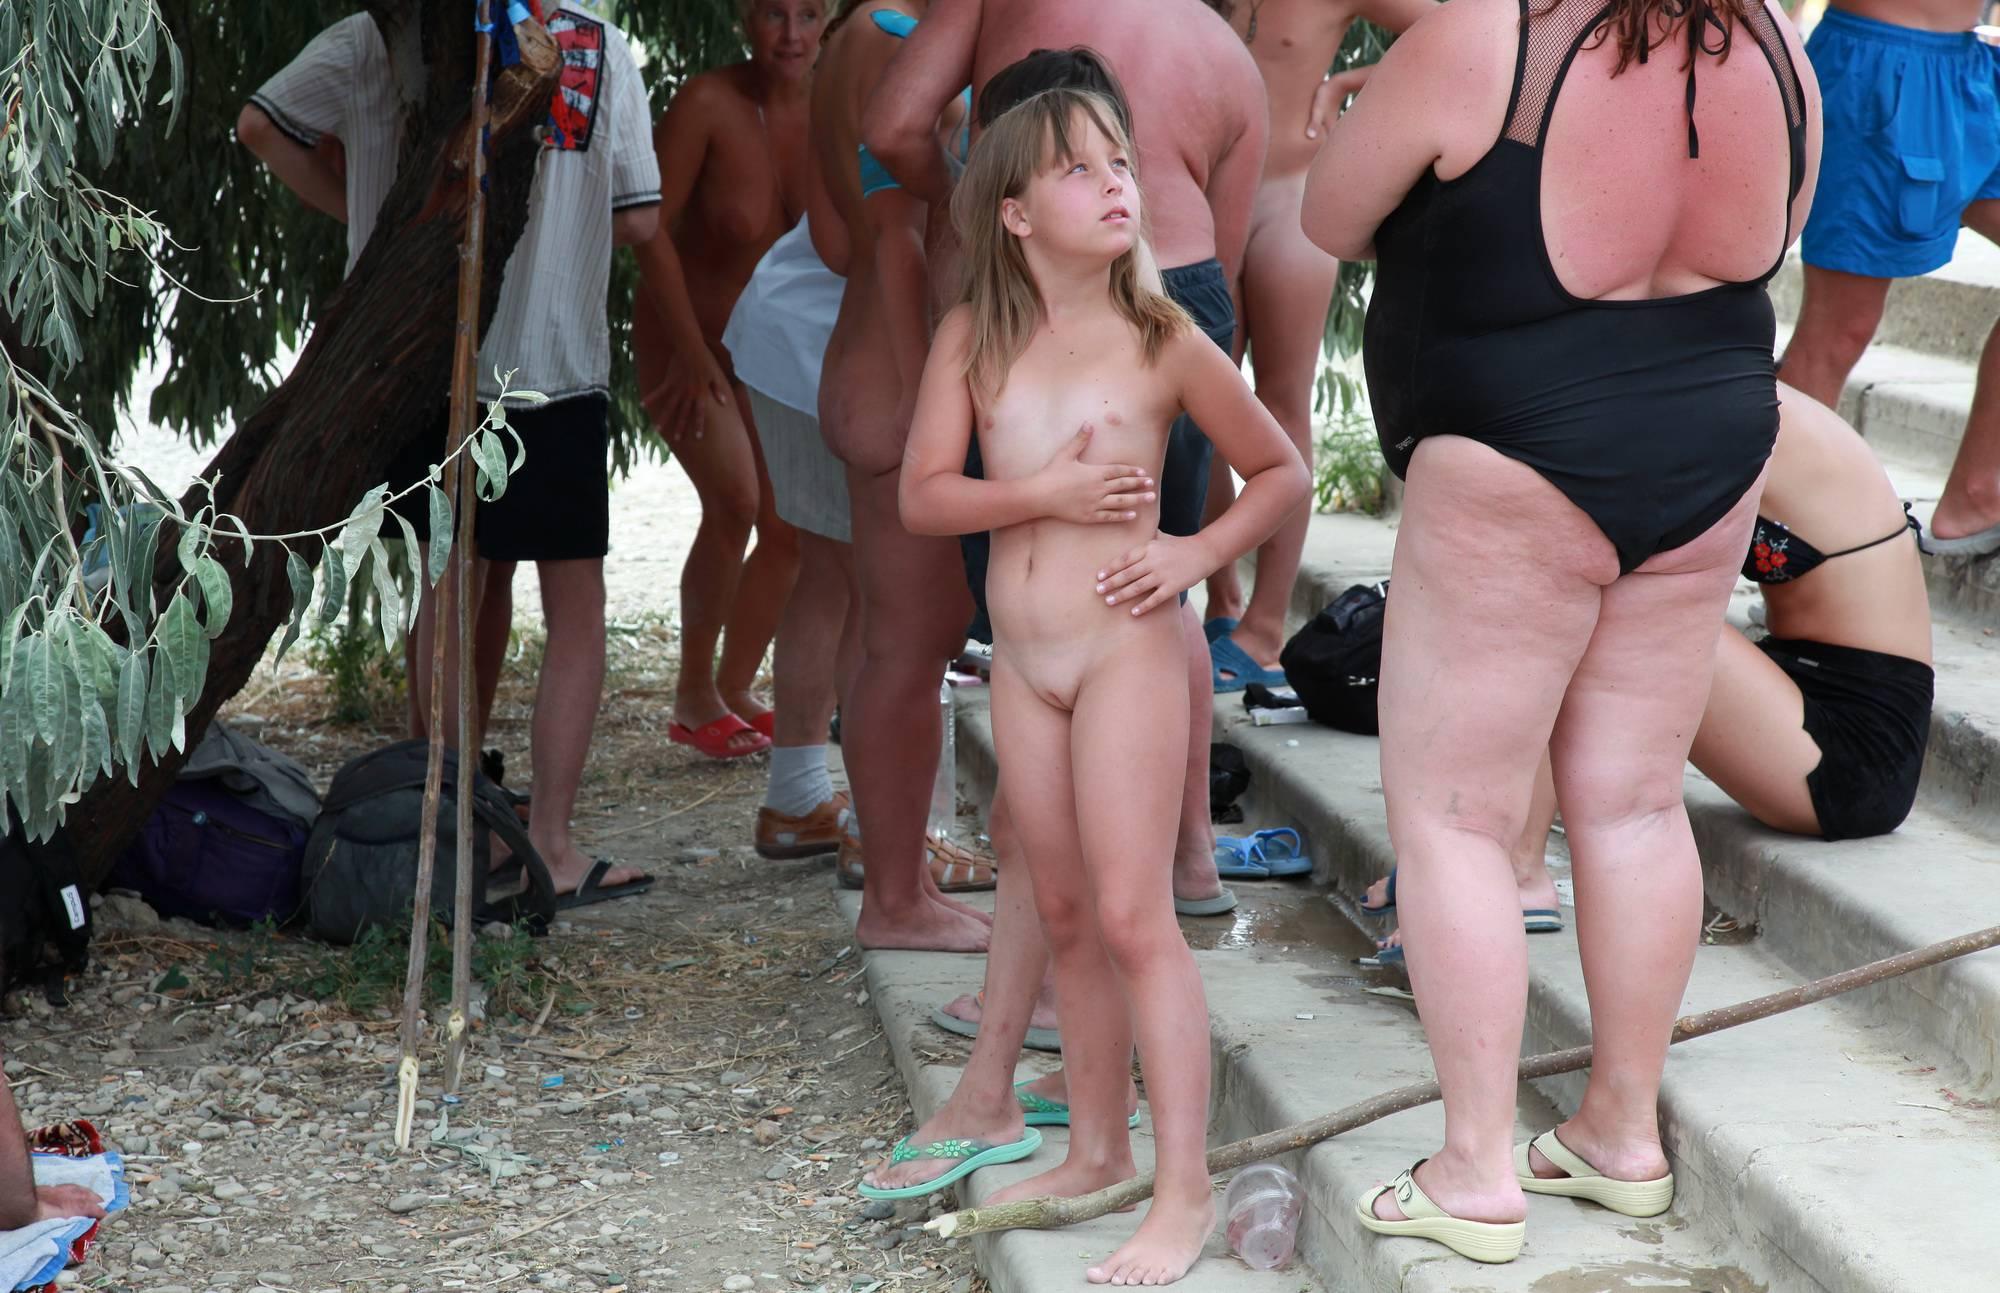 Nudist Pictures Neptune Two Nudists Wait - 2